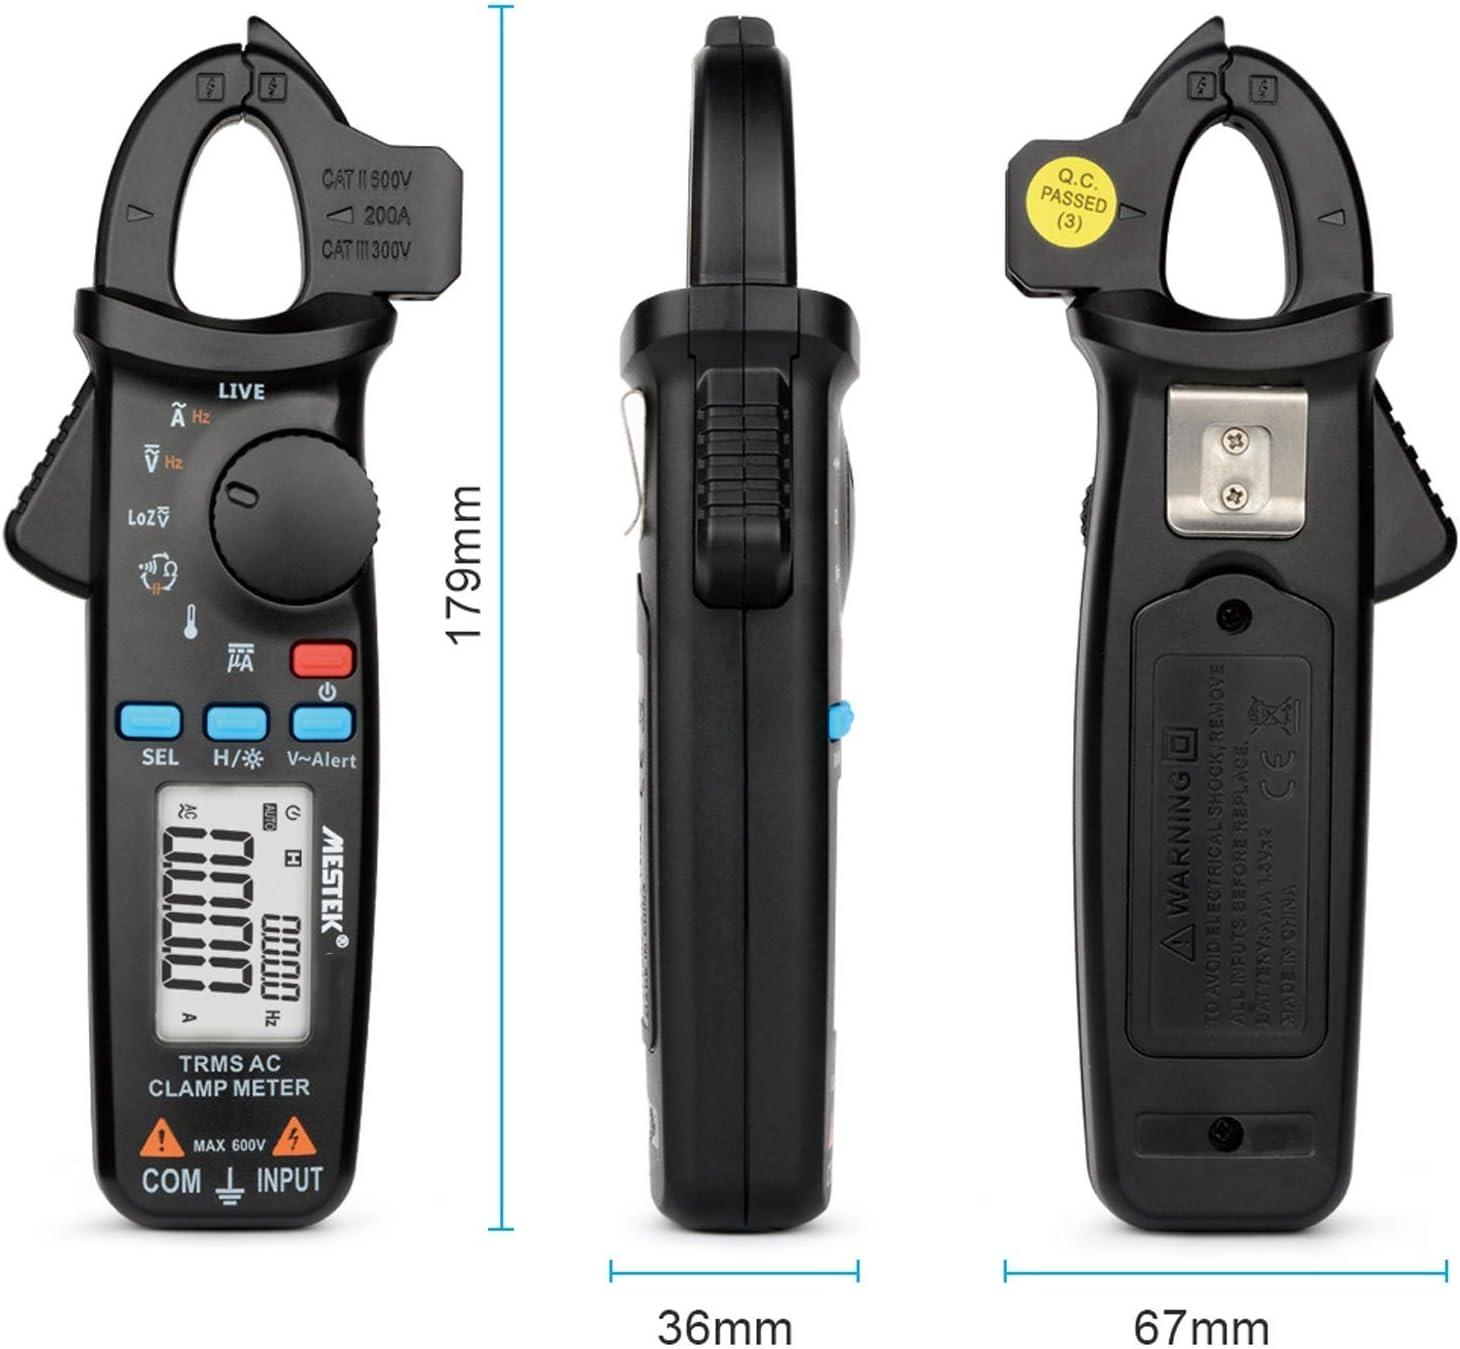 Multimeter Portable CM82C Auto Clamp Meter Pince Multimetre AC//DCpinza Amperimetrica Digital Clamp Meters Scientific Products